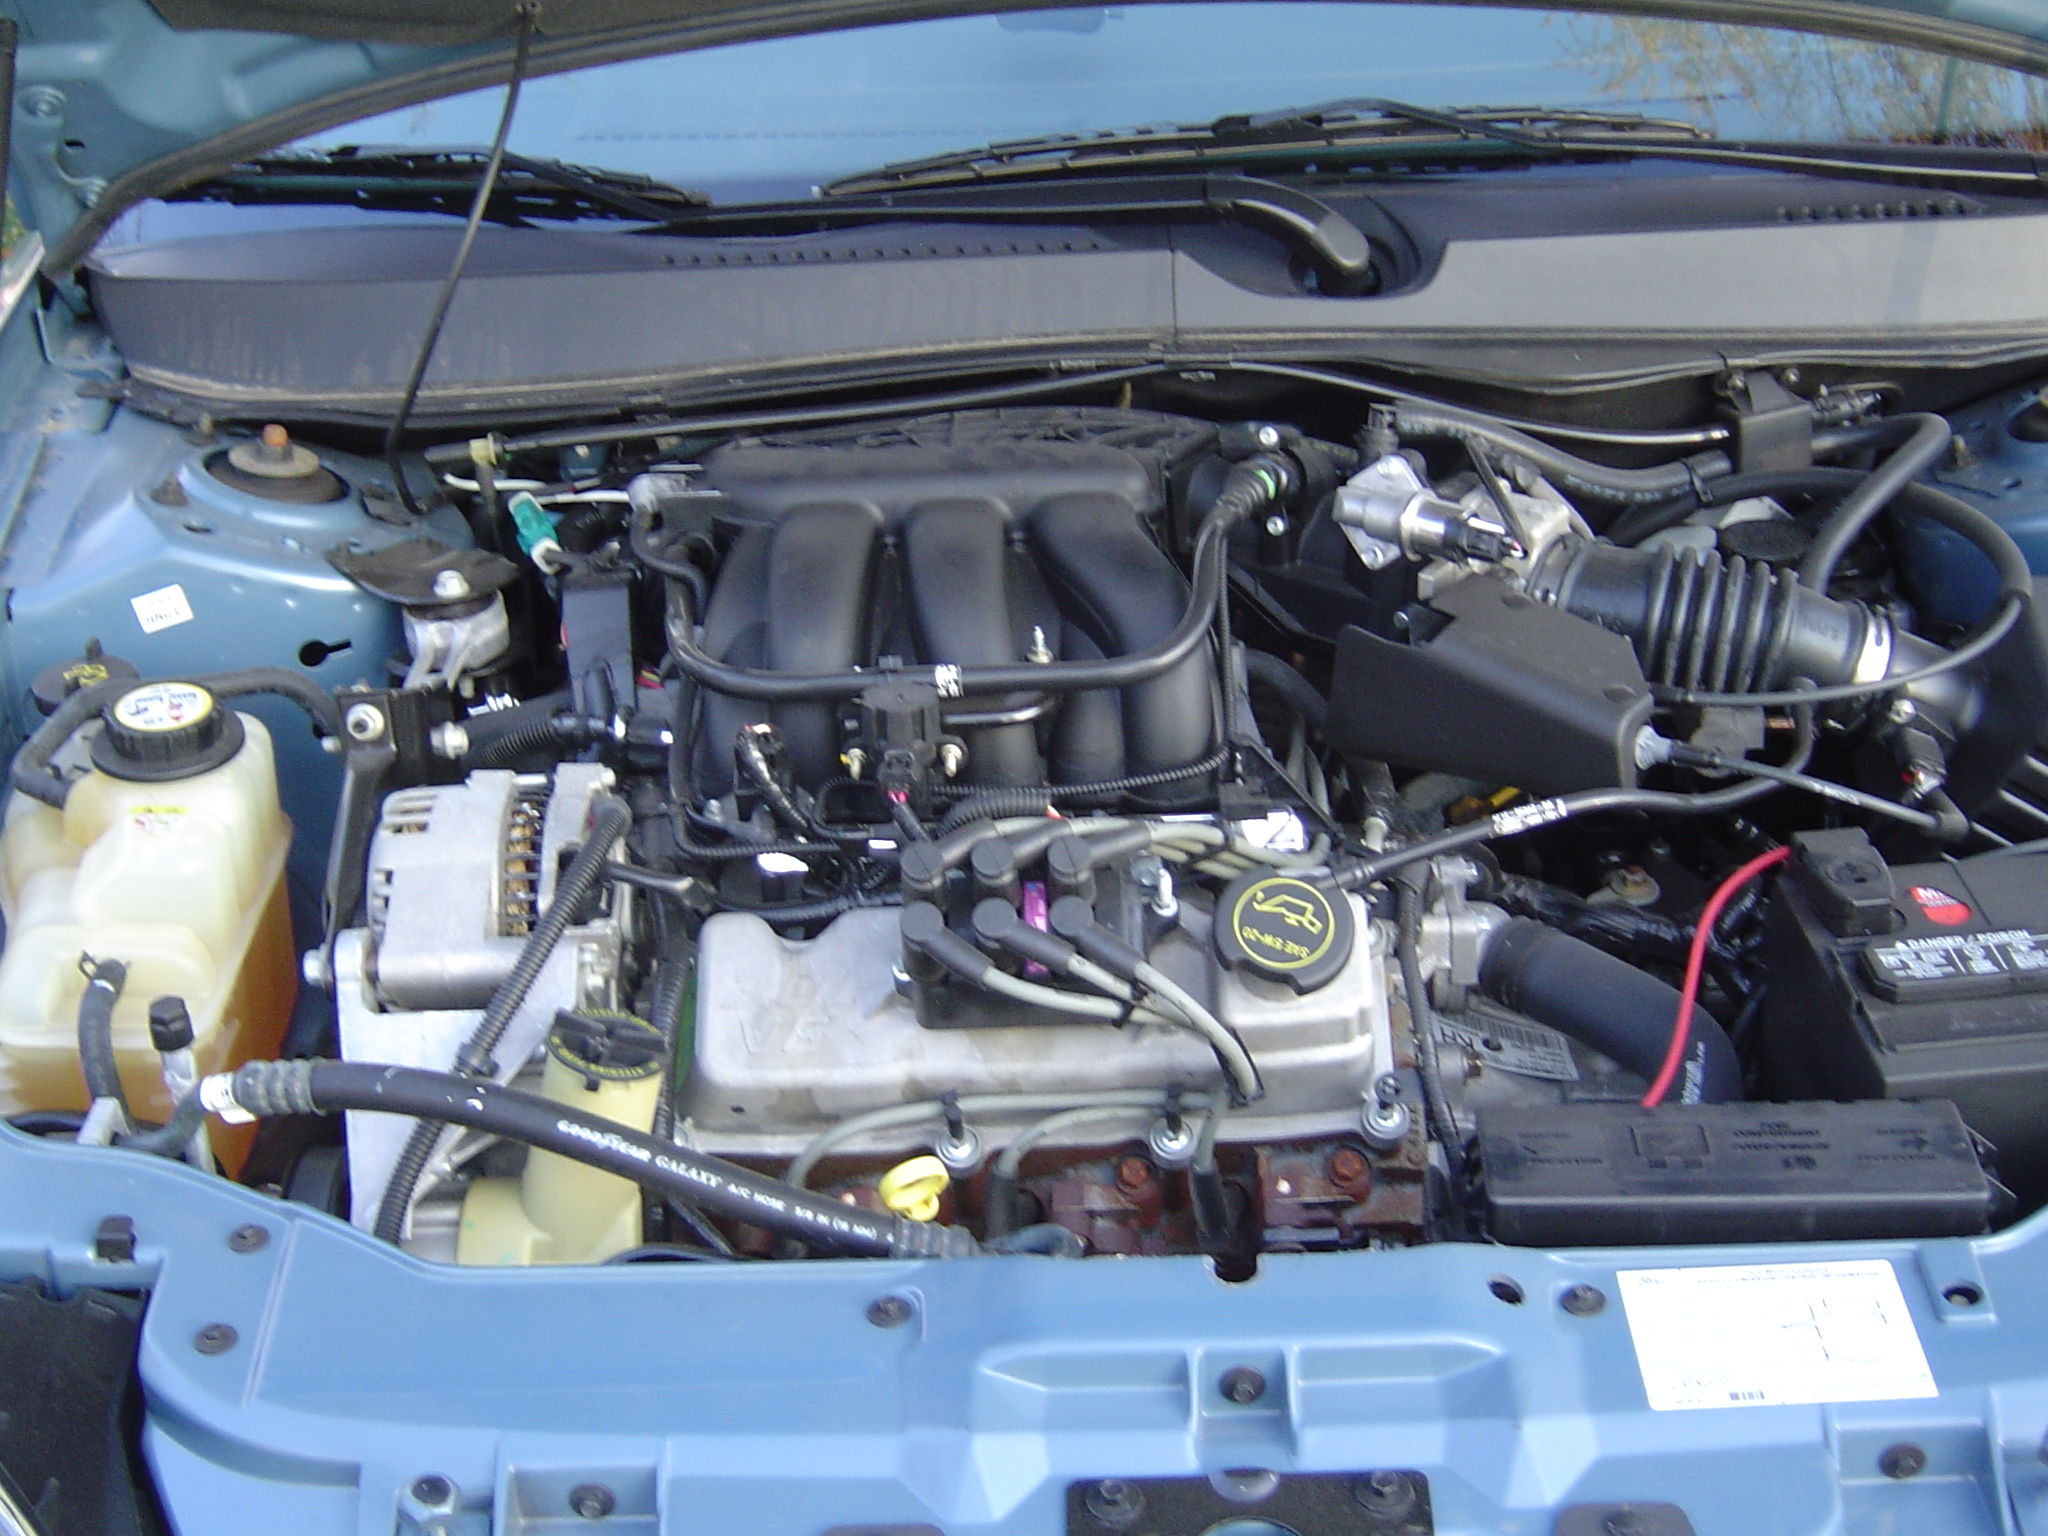 TX_4858] Ford Taurus 3 0 Vulcan Engine Wiring DiagramLectr Ical Perm Sple Hendil Mohammedshrine Librar Wiring 101